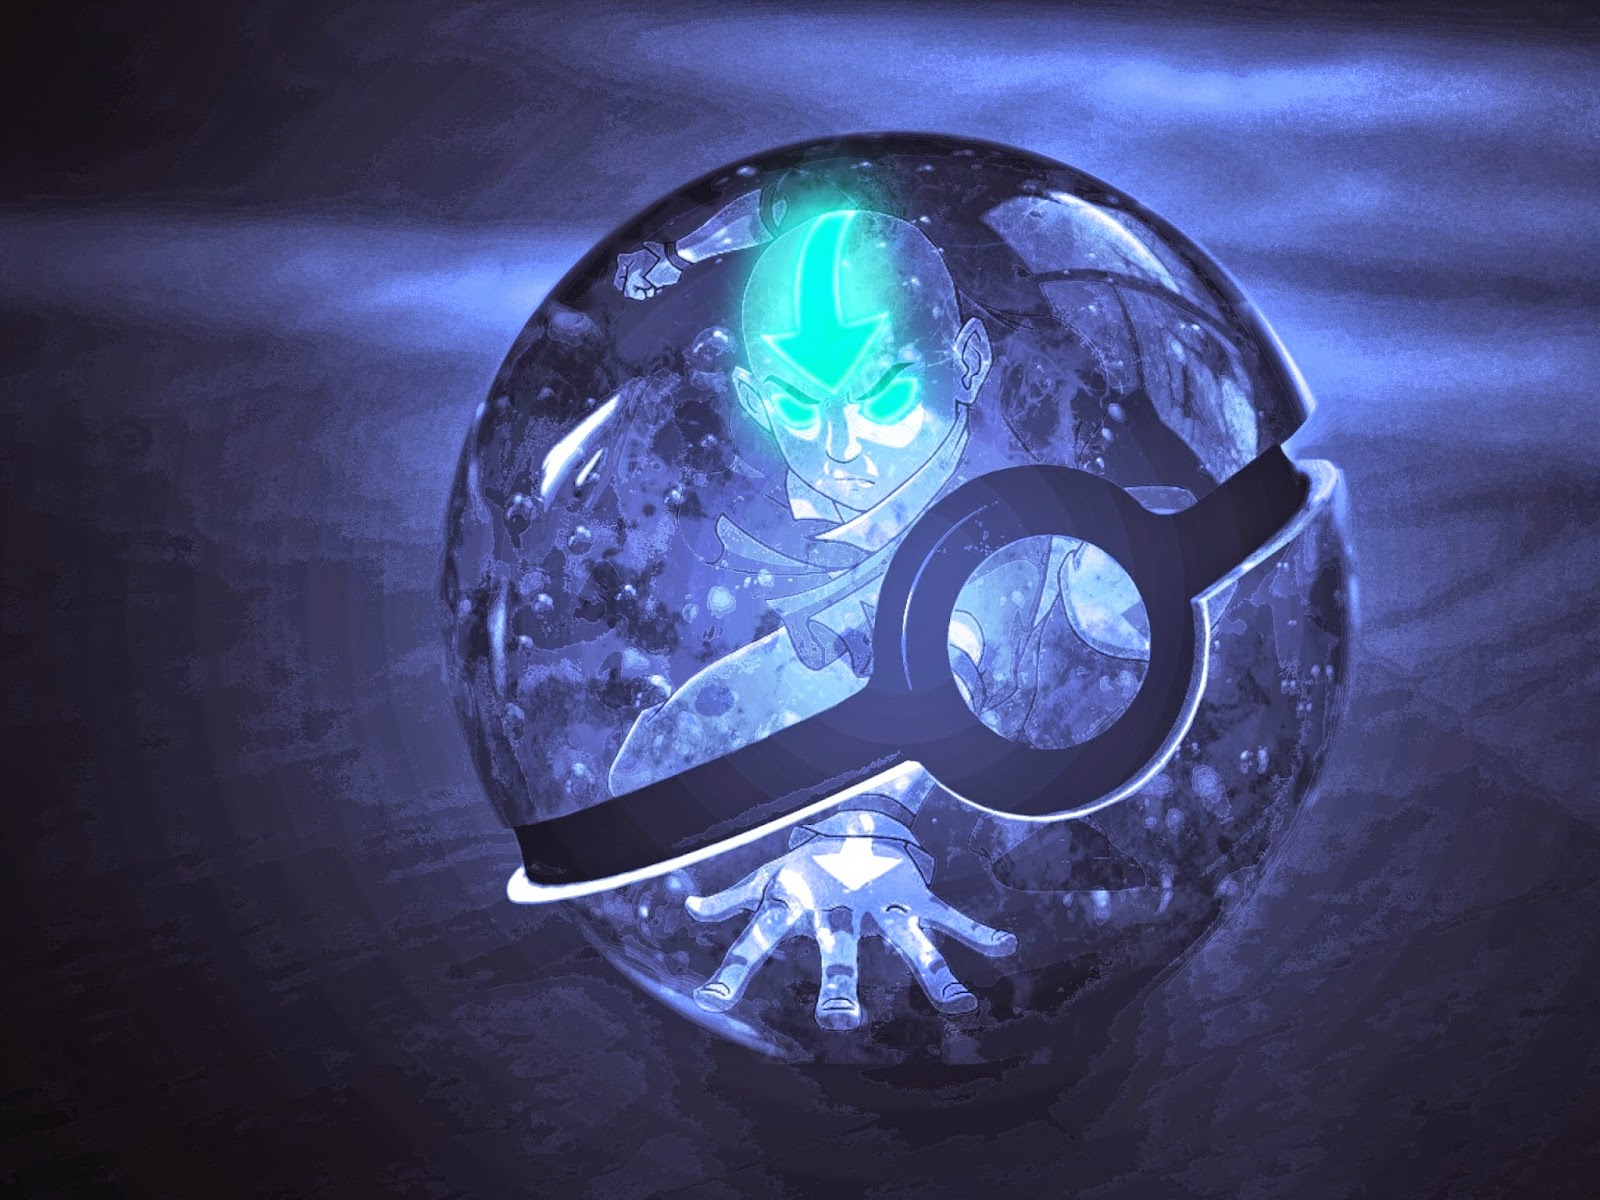 Fondos De Pantalla De Pokemon 3d